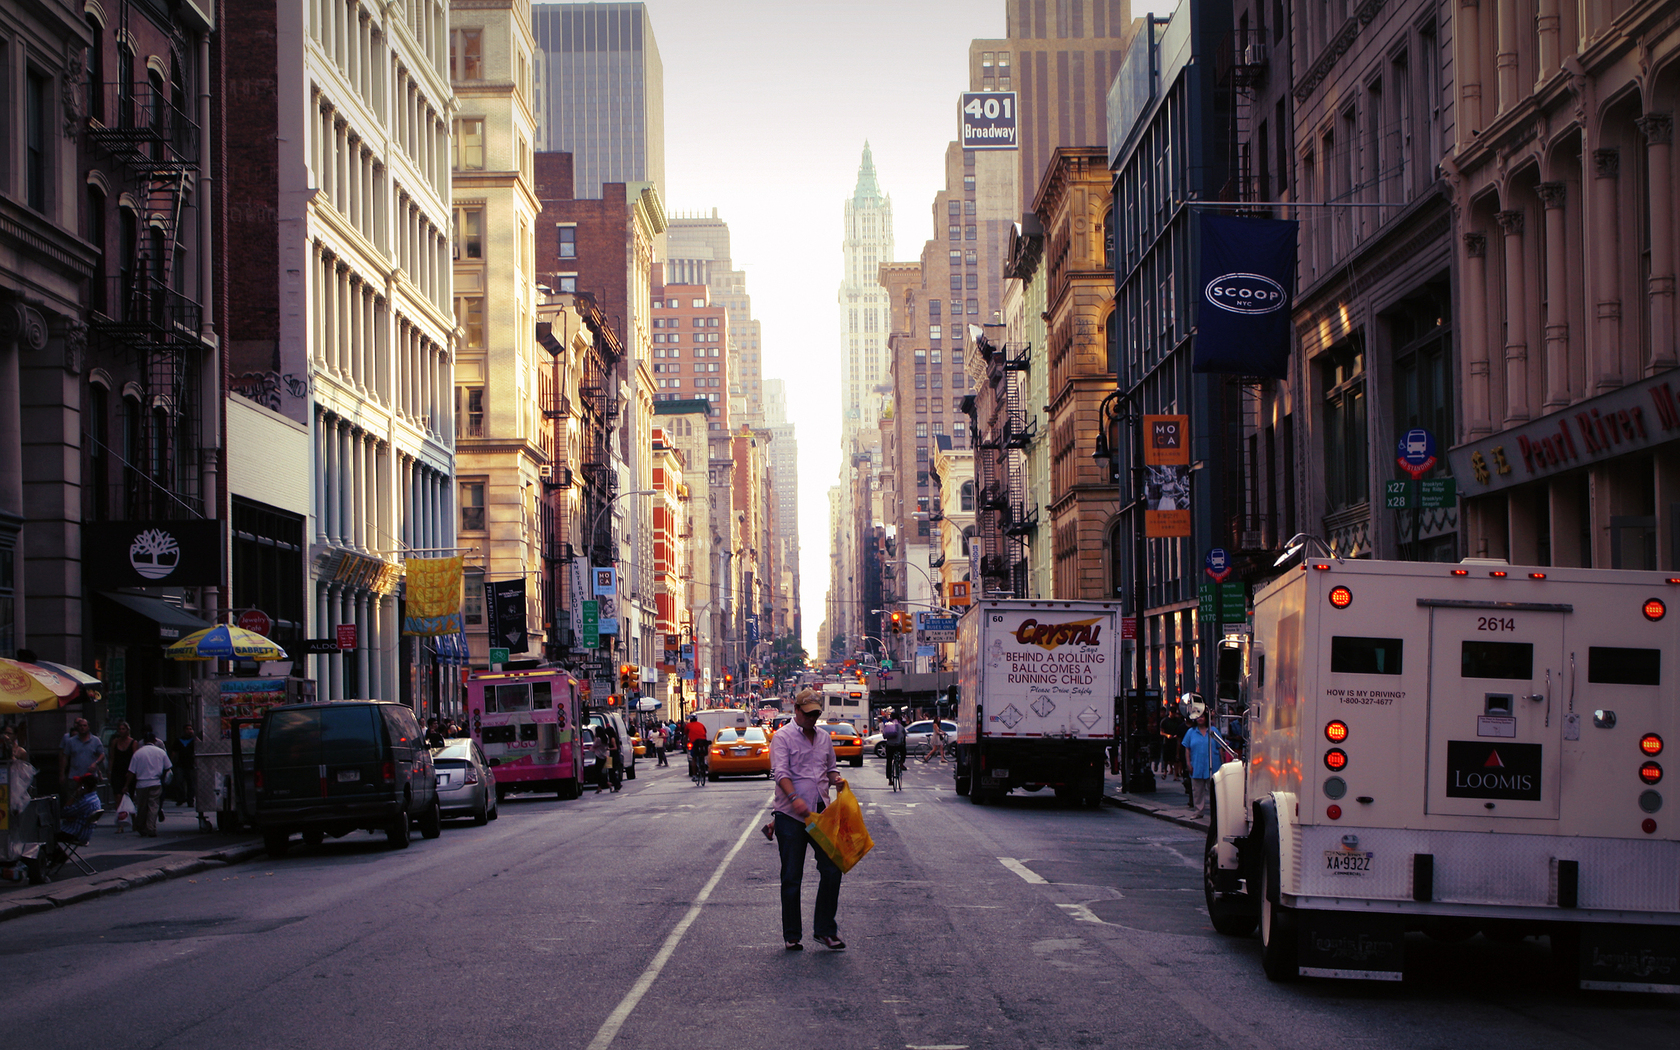 new york city street wallpapers - 1680x1050 - 2102721